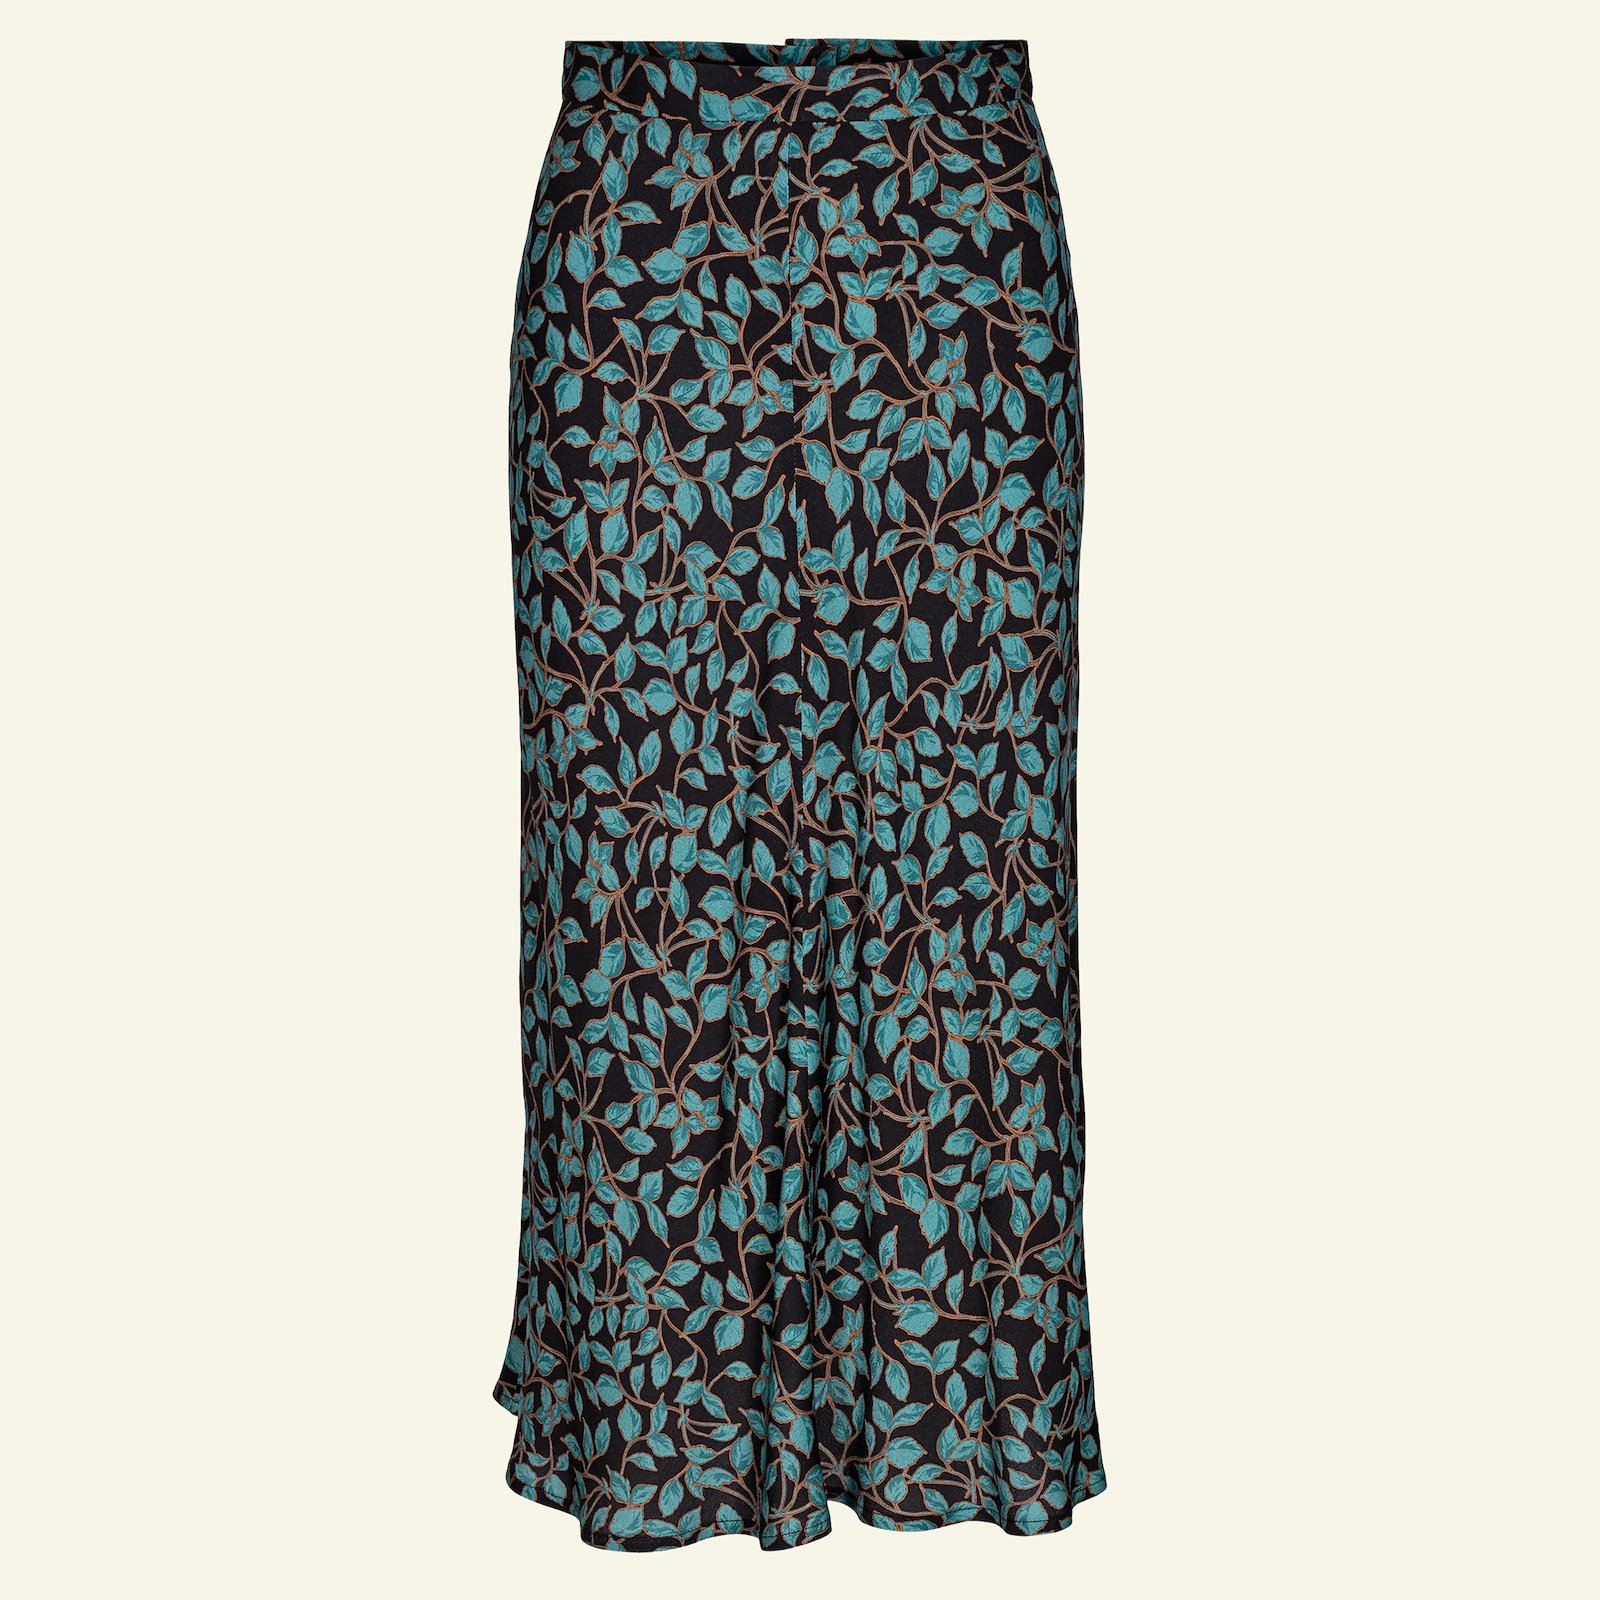 Skirt with A-shape, 38/10 p21038_730098_sskit